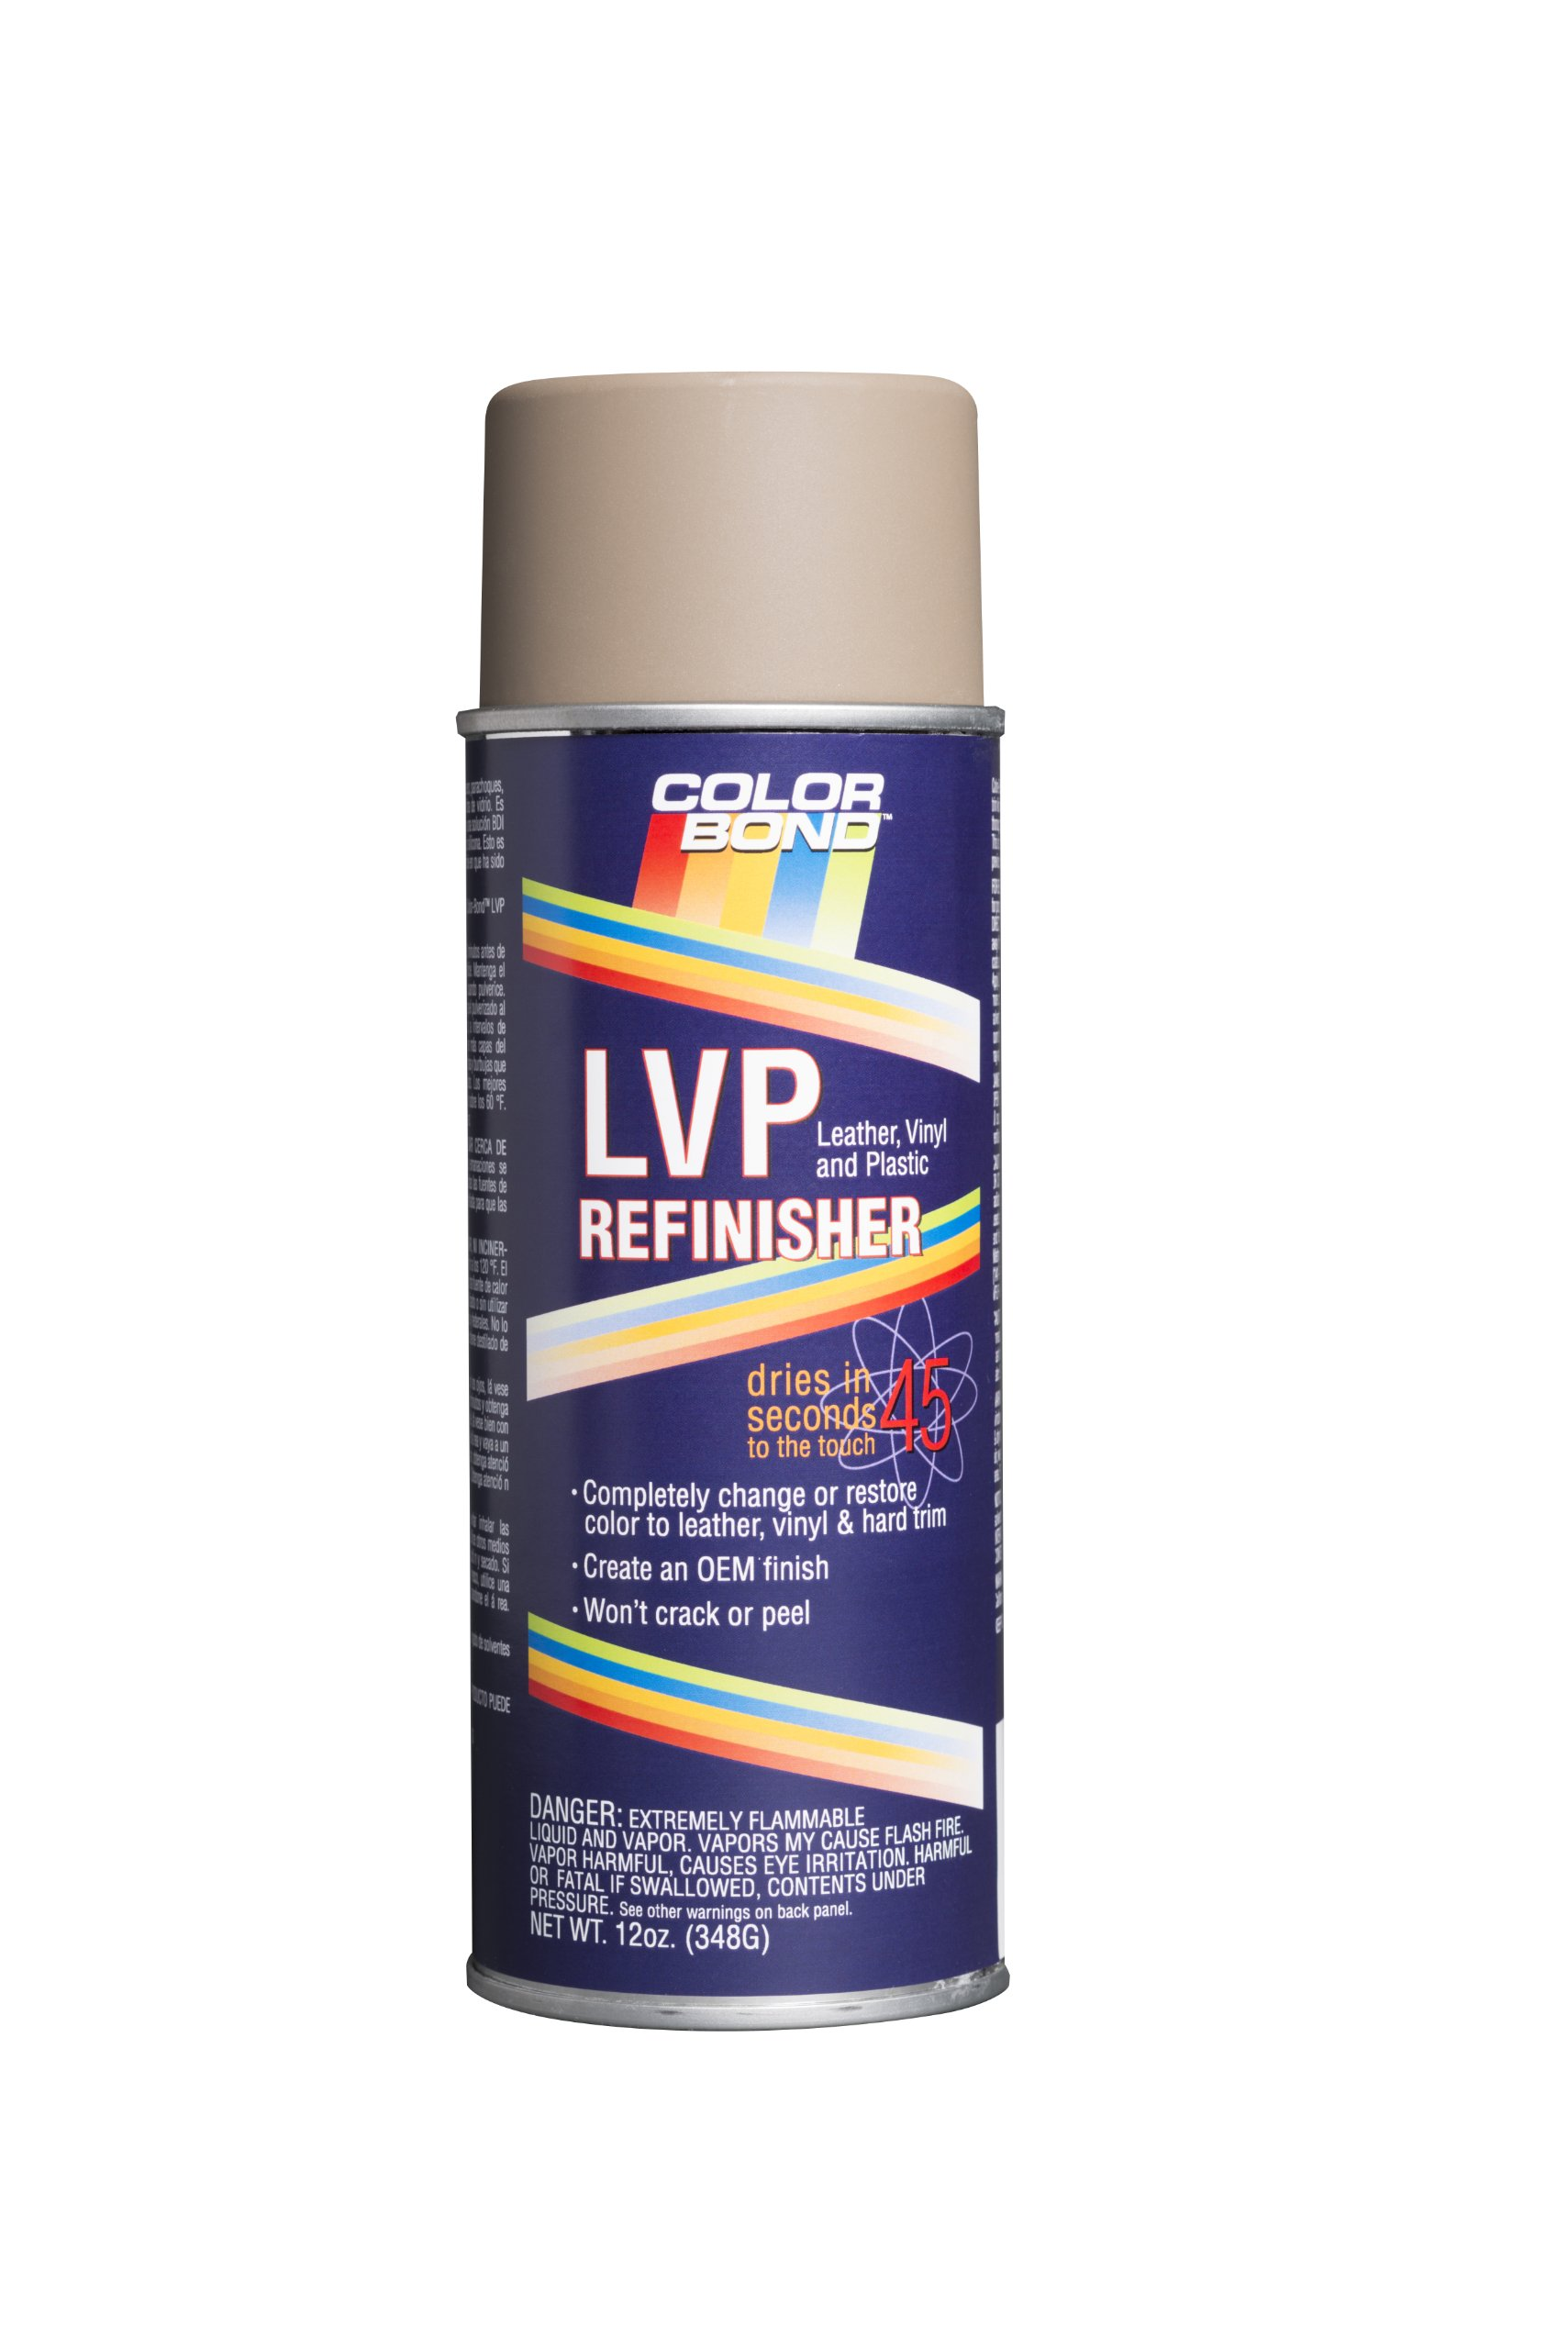 Colorbond 253 BMW Ghost Gray LVP Leather, Vinyl & Hard Plastic Refinisher Spray Paint - 12 oz.